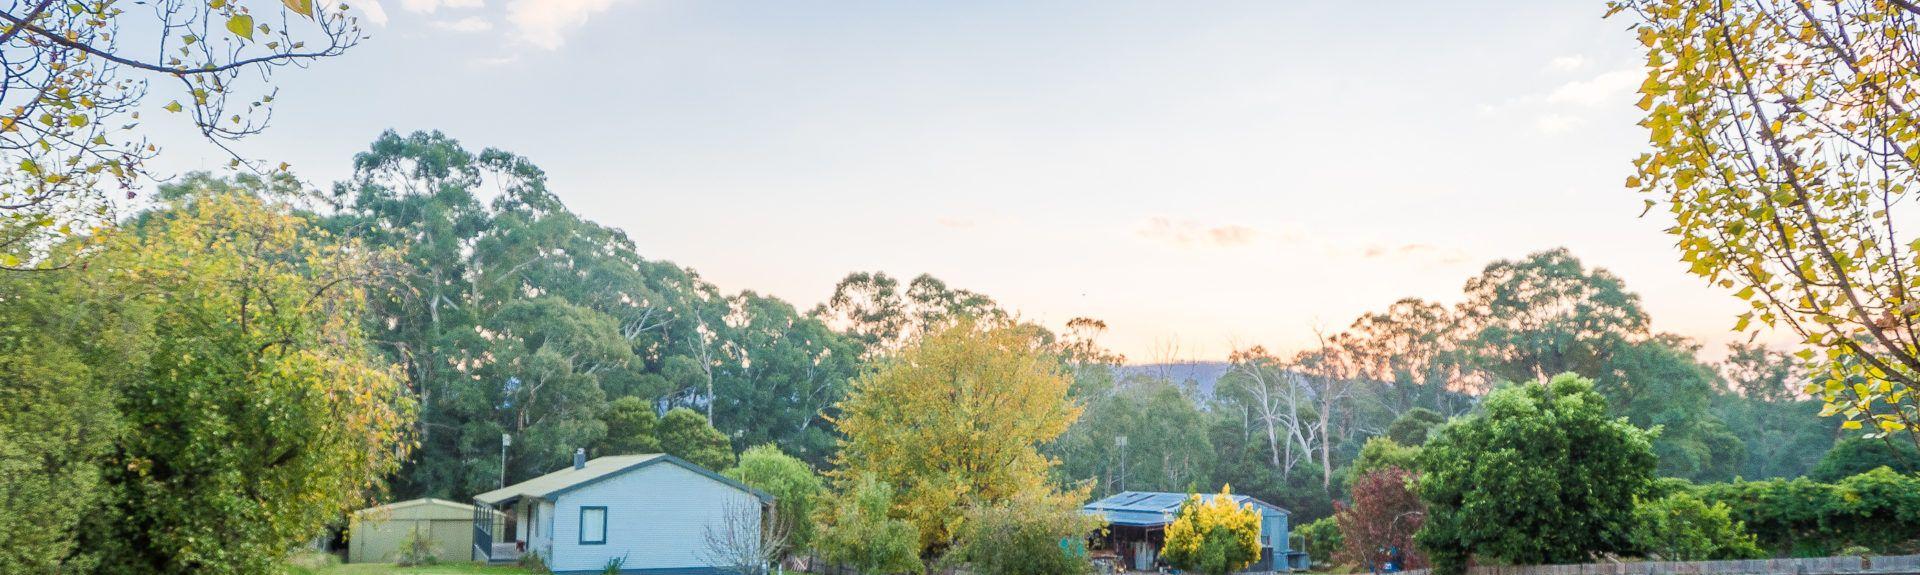 Narbethong, Victoria, Australie